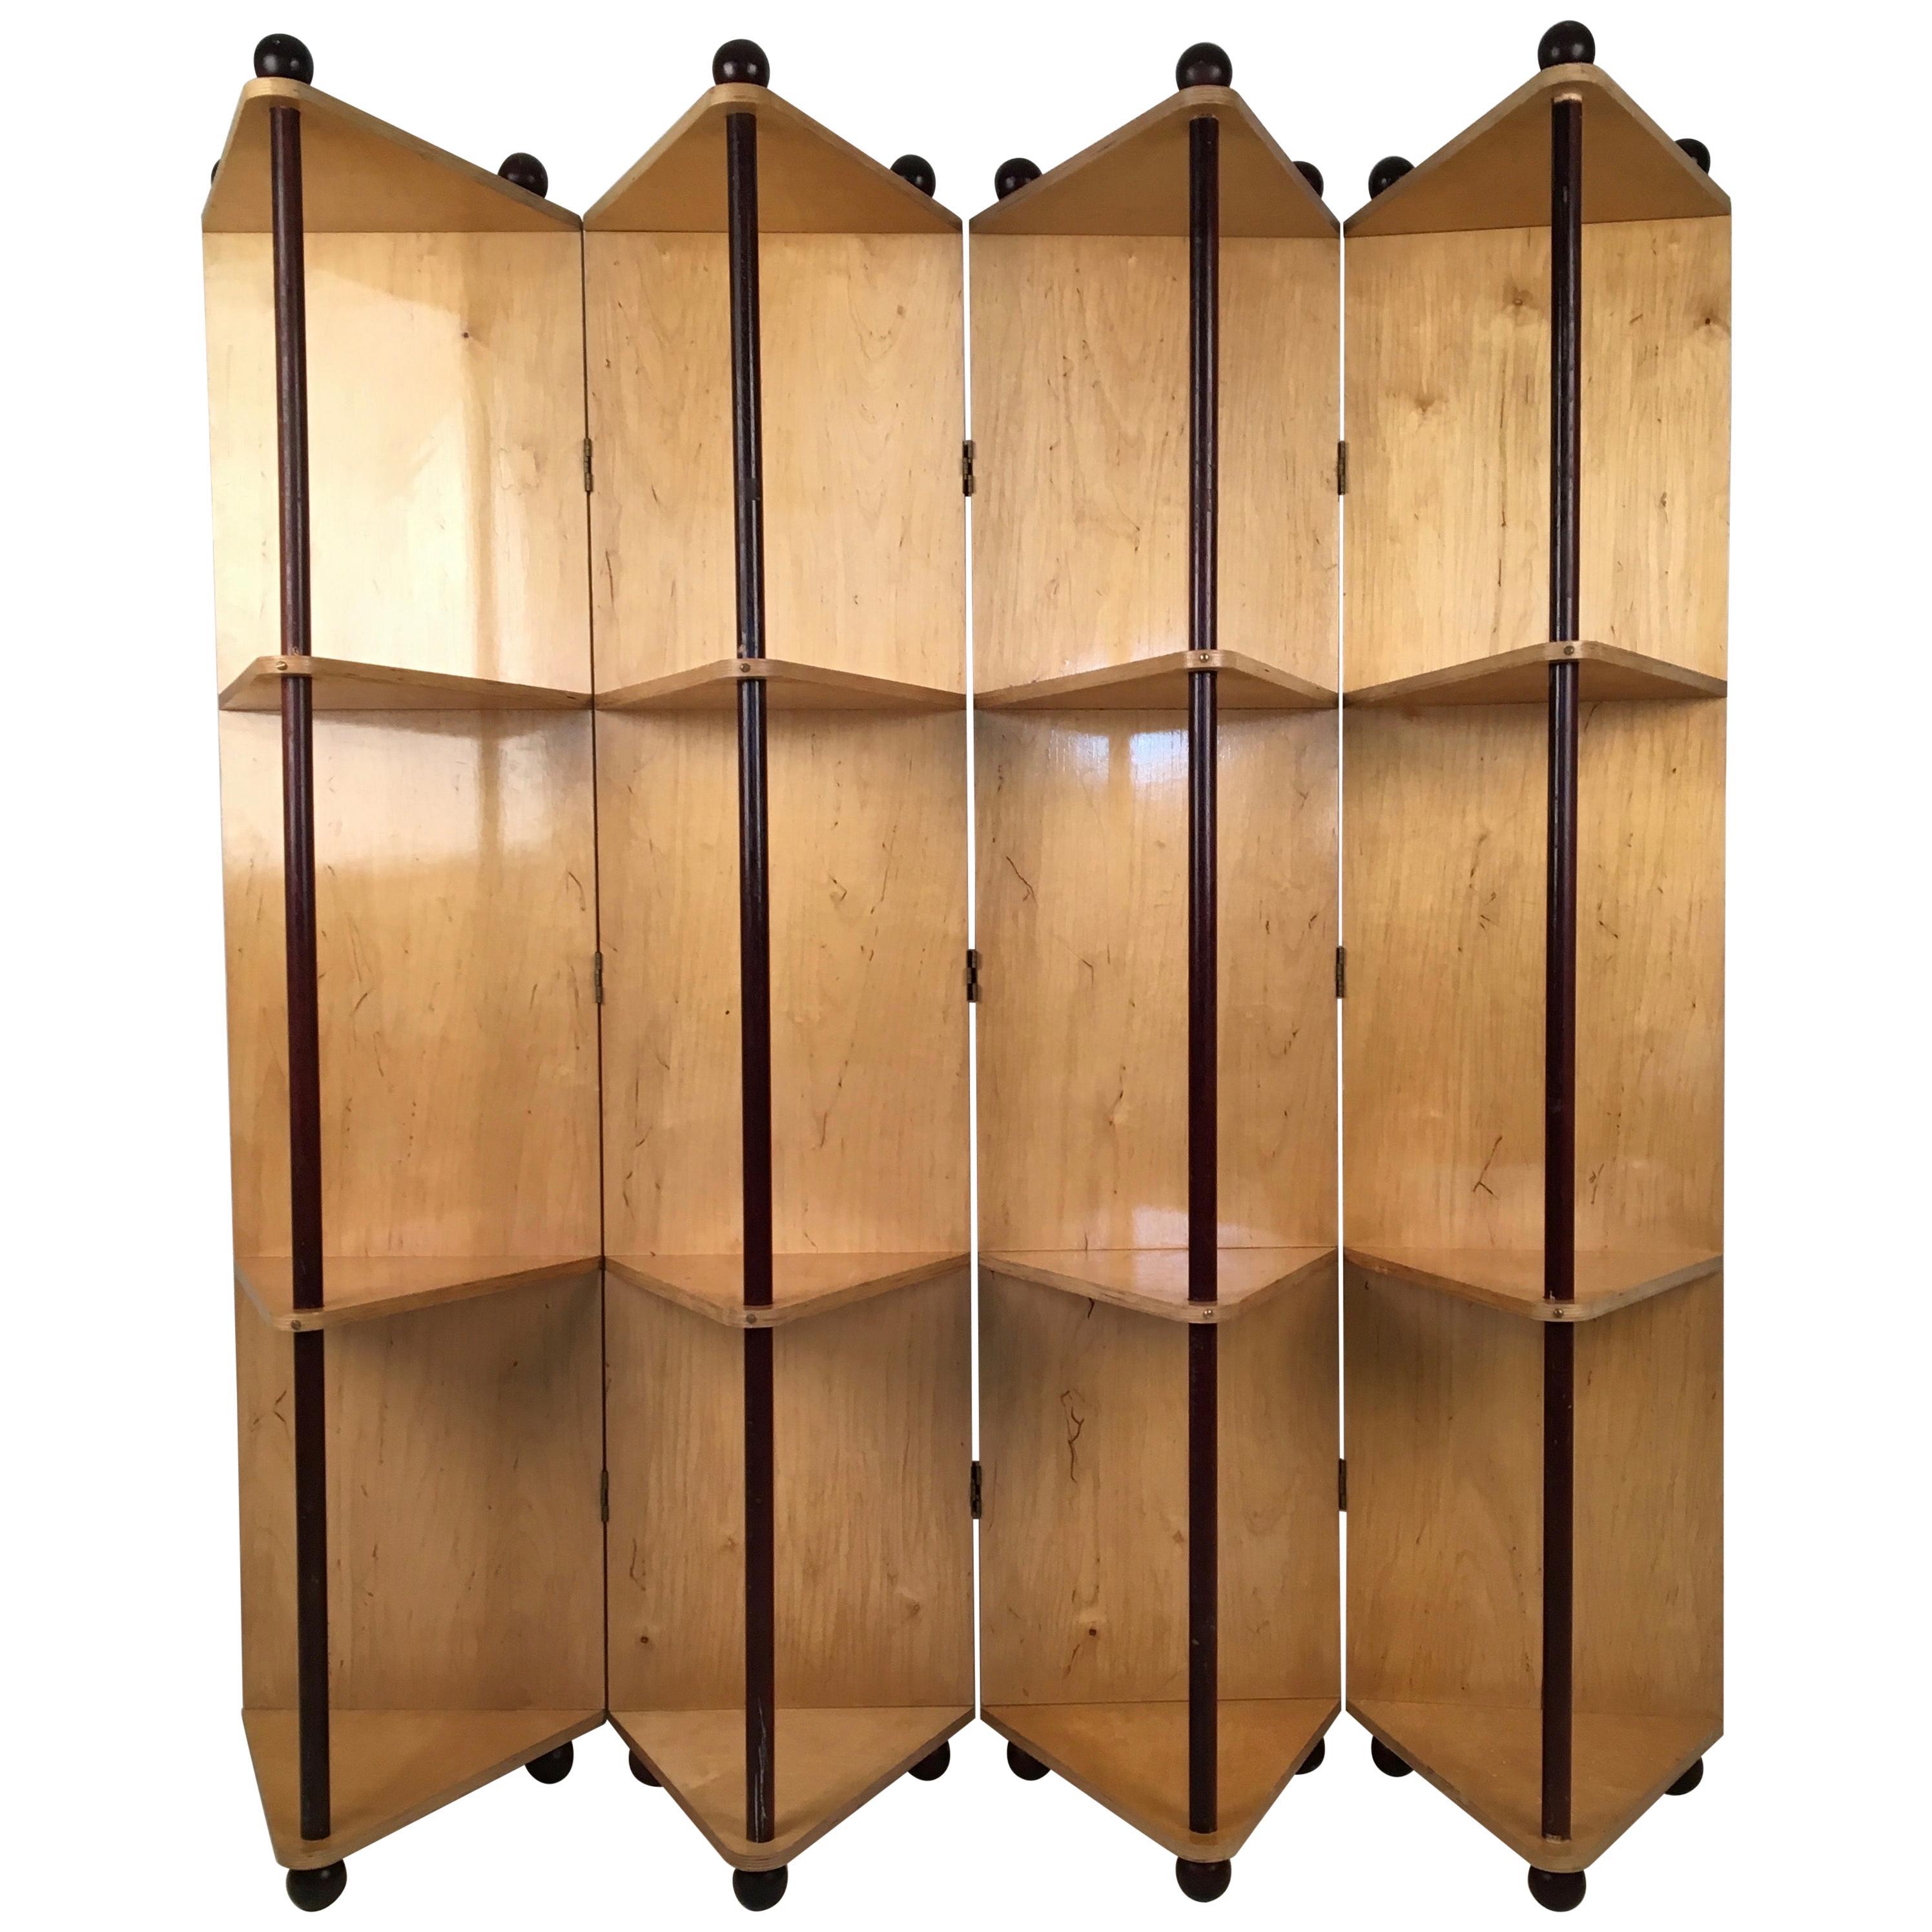 Postmodern Plywood Prototype Metamorphic Shelving Room Divider Circa 1980